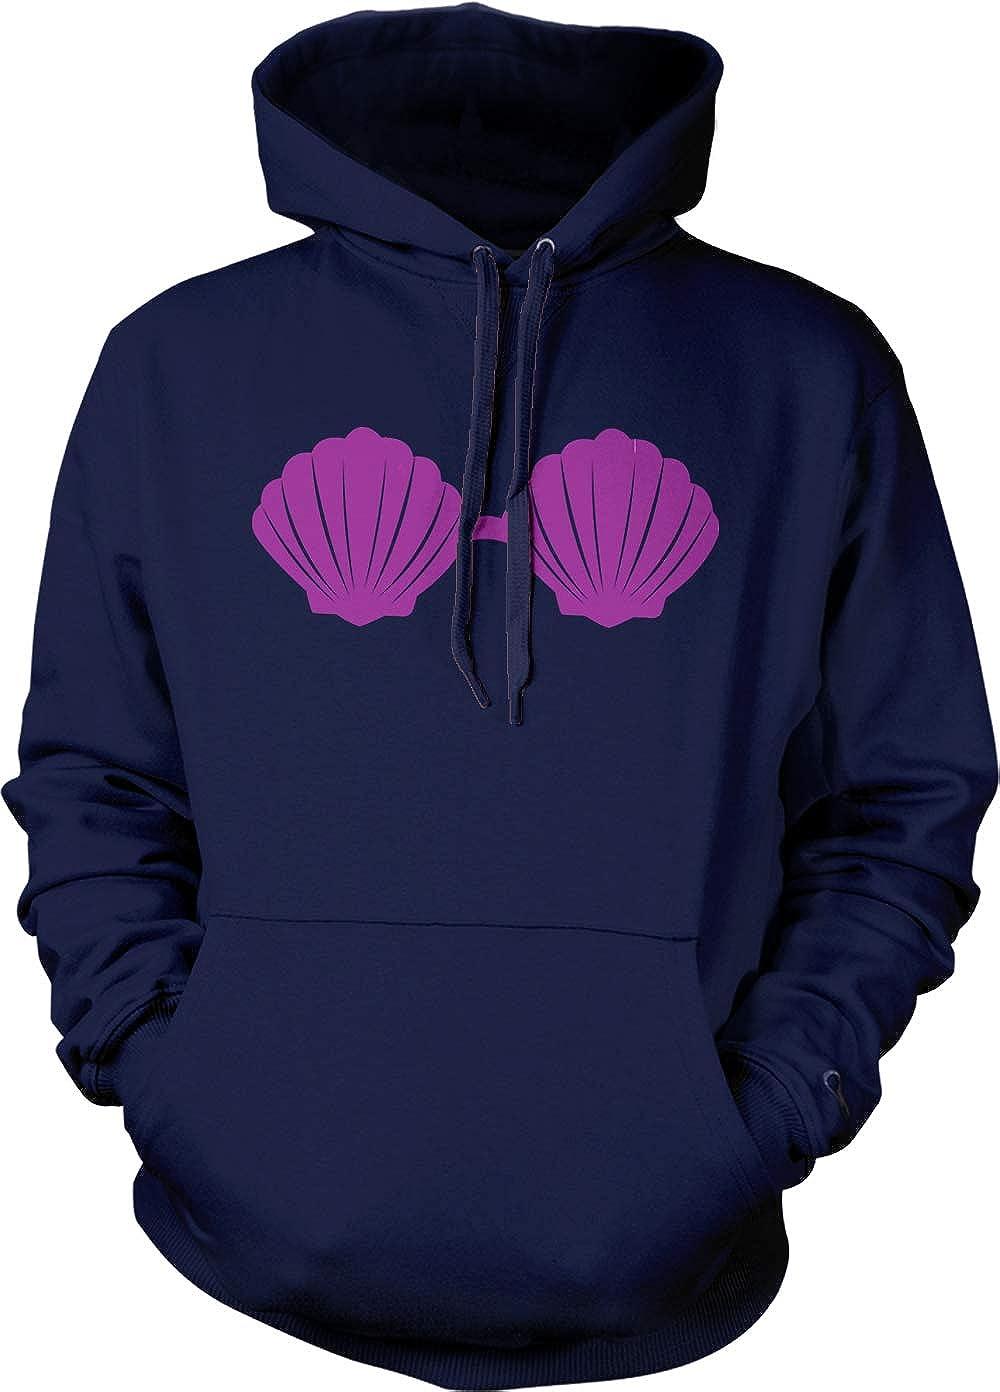 Funny Mermaid Nautical Unisex Hoodie Sweatshirt Seashell Bra